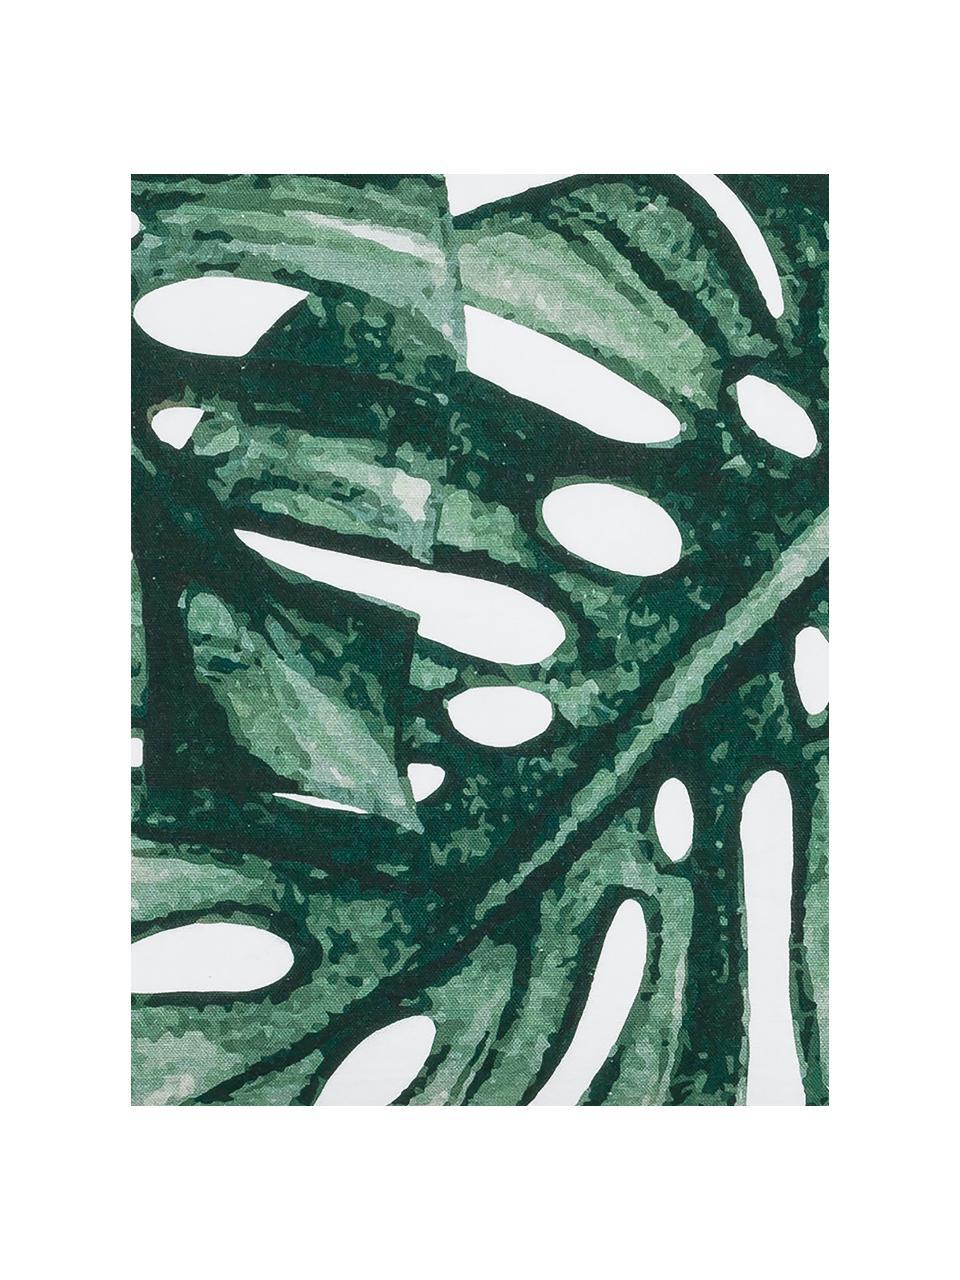 Kissenhülle Tropics mit Monstera Print in Grün/Weiß, 100% Baumwolle, Grün, Weiß, 50 x 50 cm